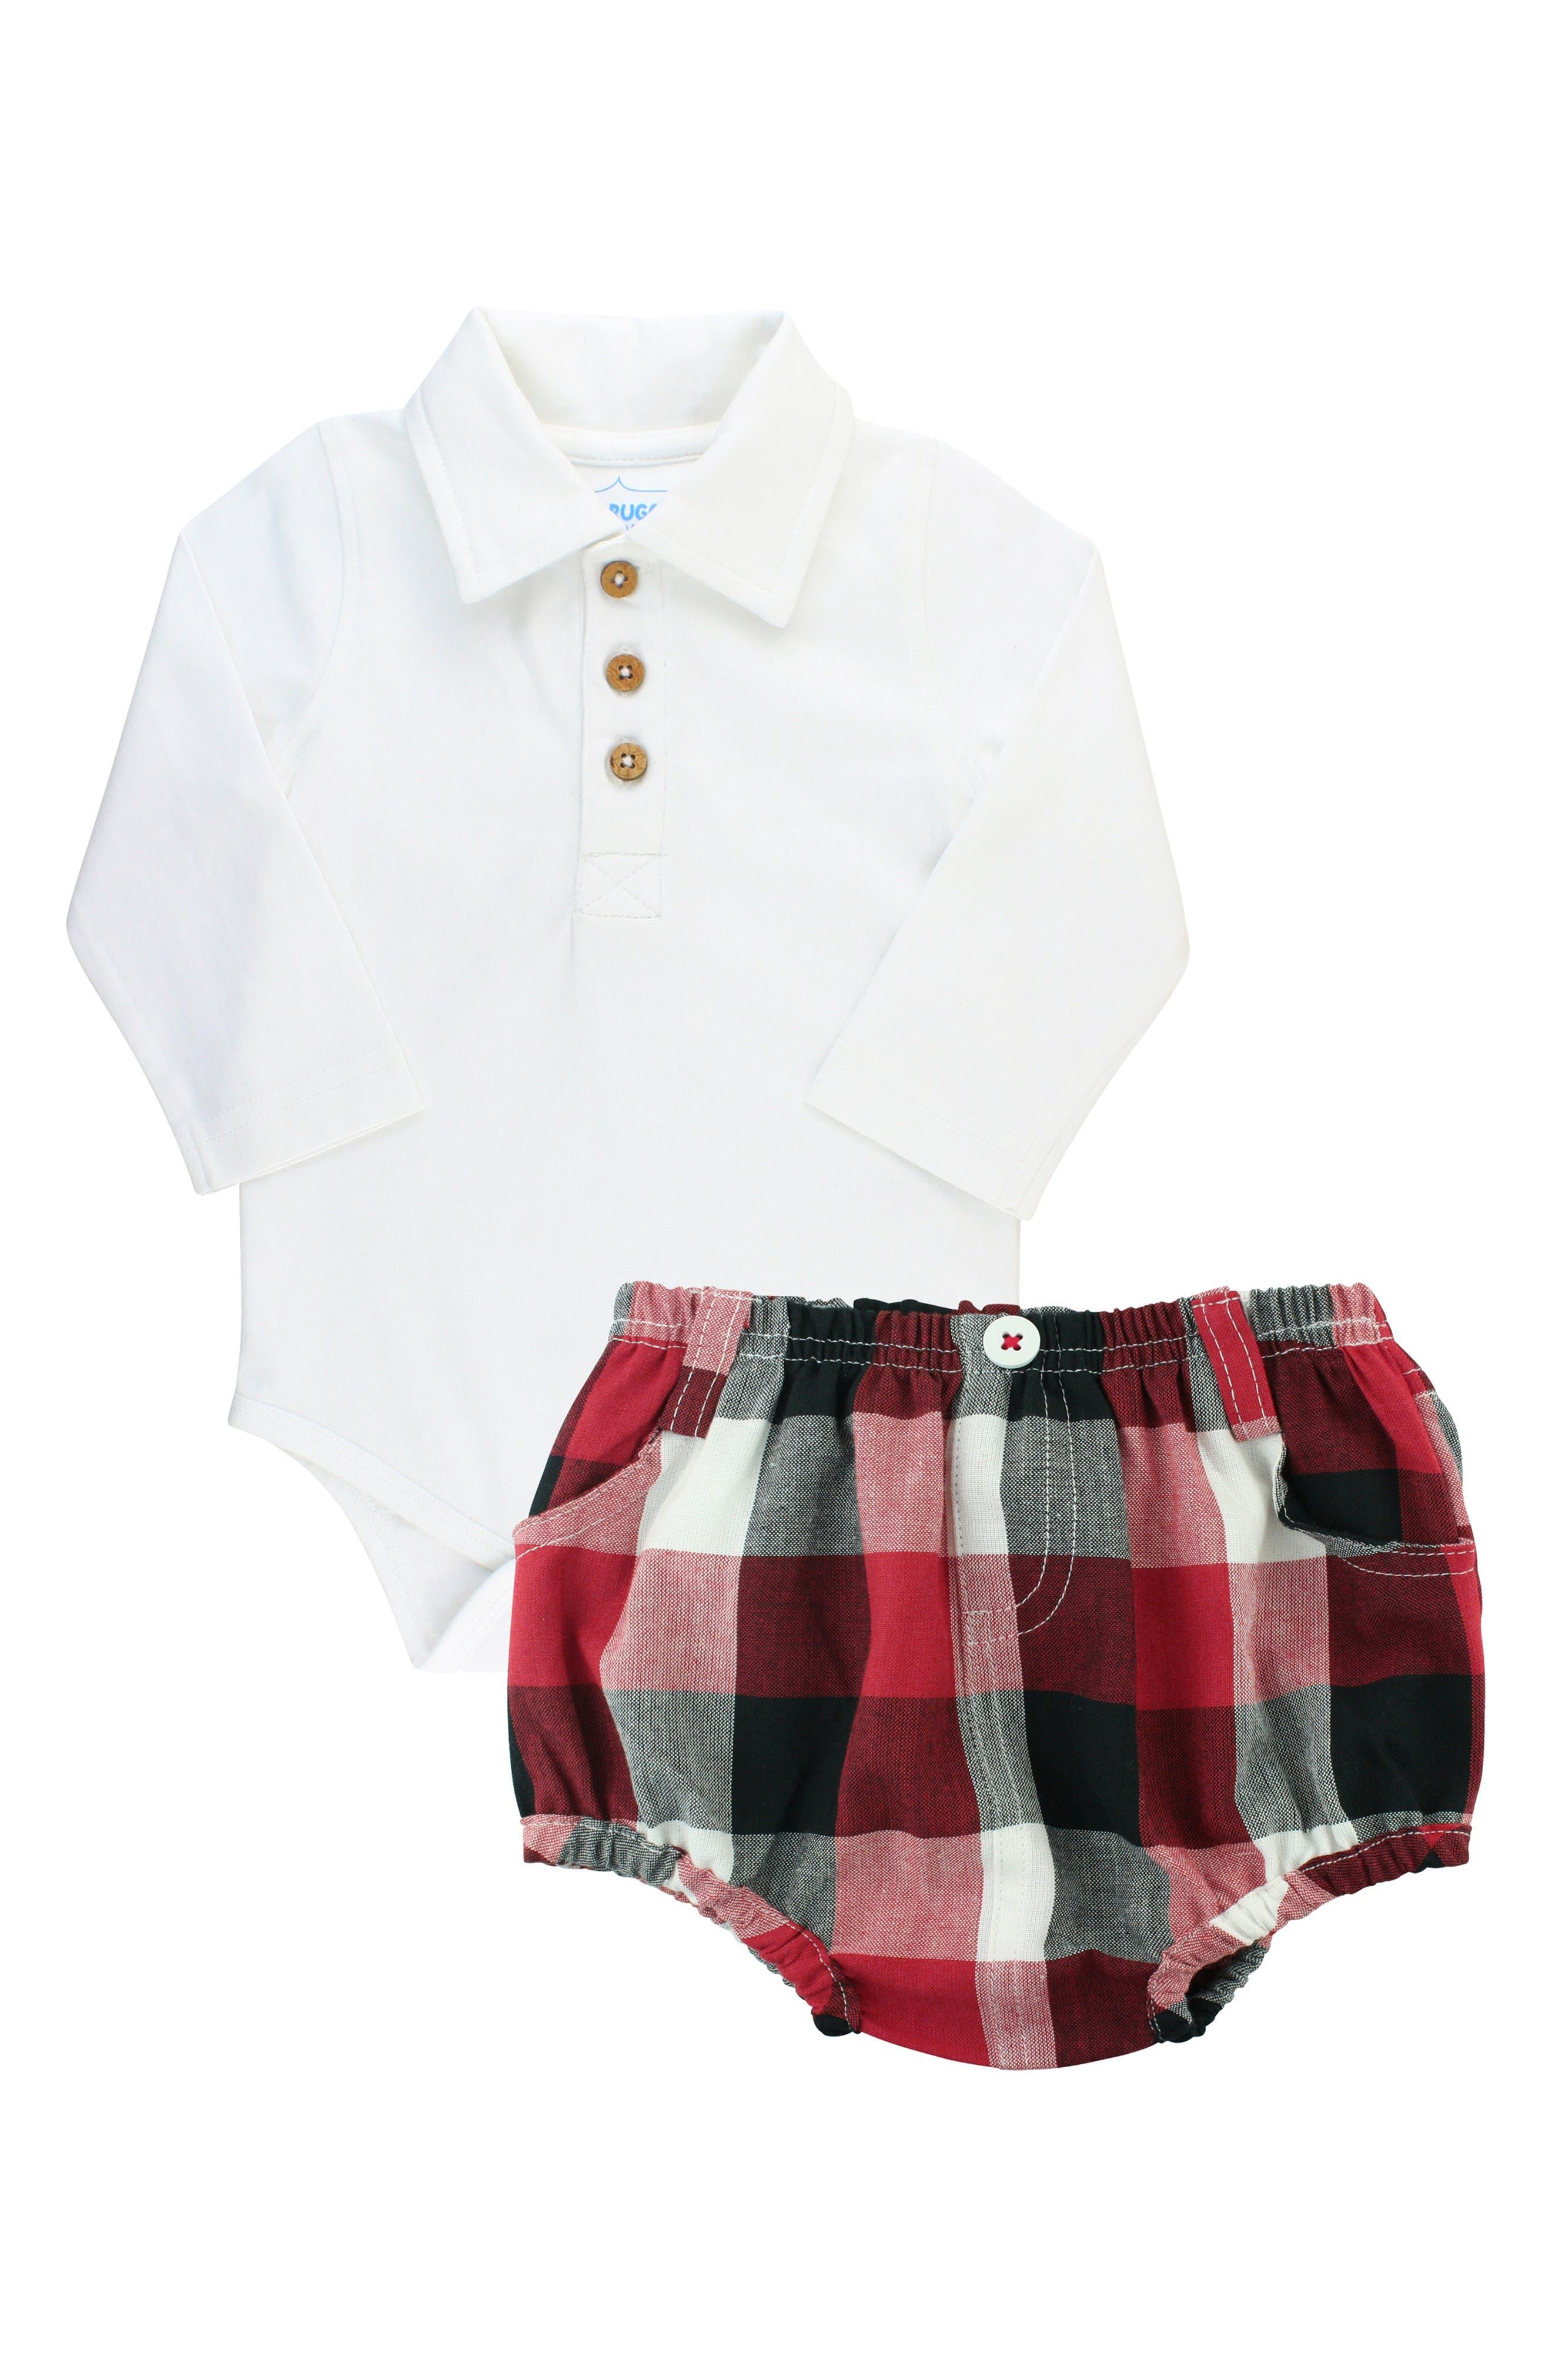 Infant Boys Ruggedbutts Polo Bodysuit  Check Shorts